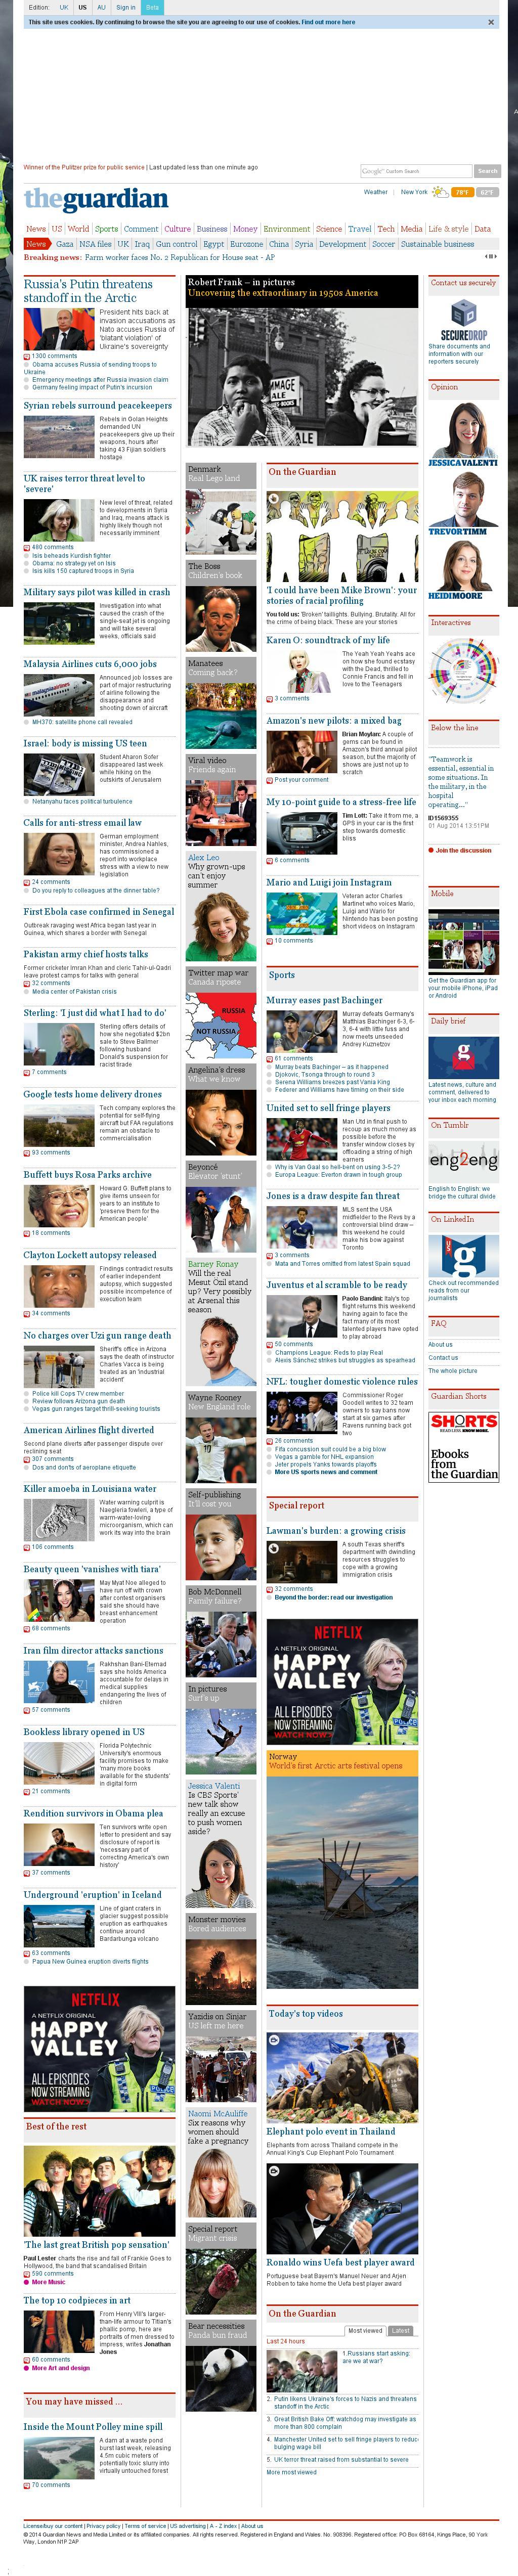 The Guardian at Friday Aug. 29, 2014, 3:07 p.m. UTC